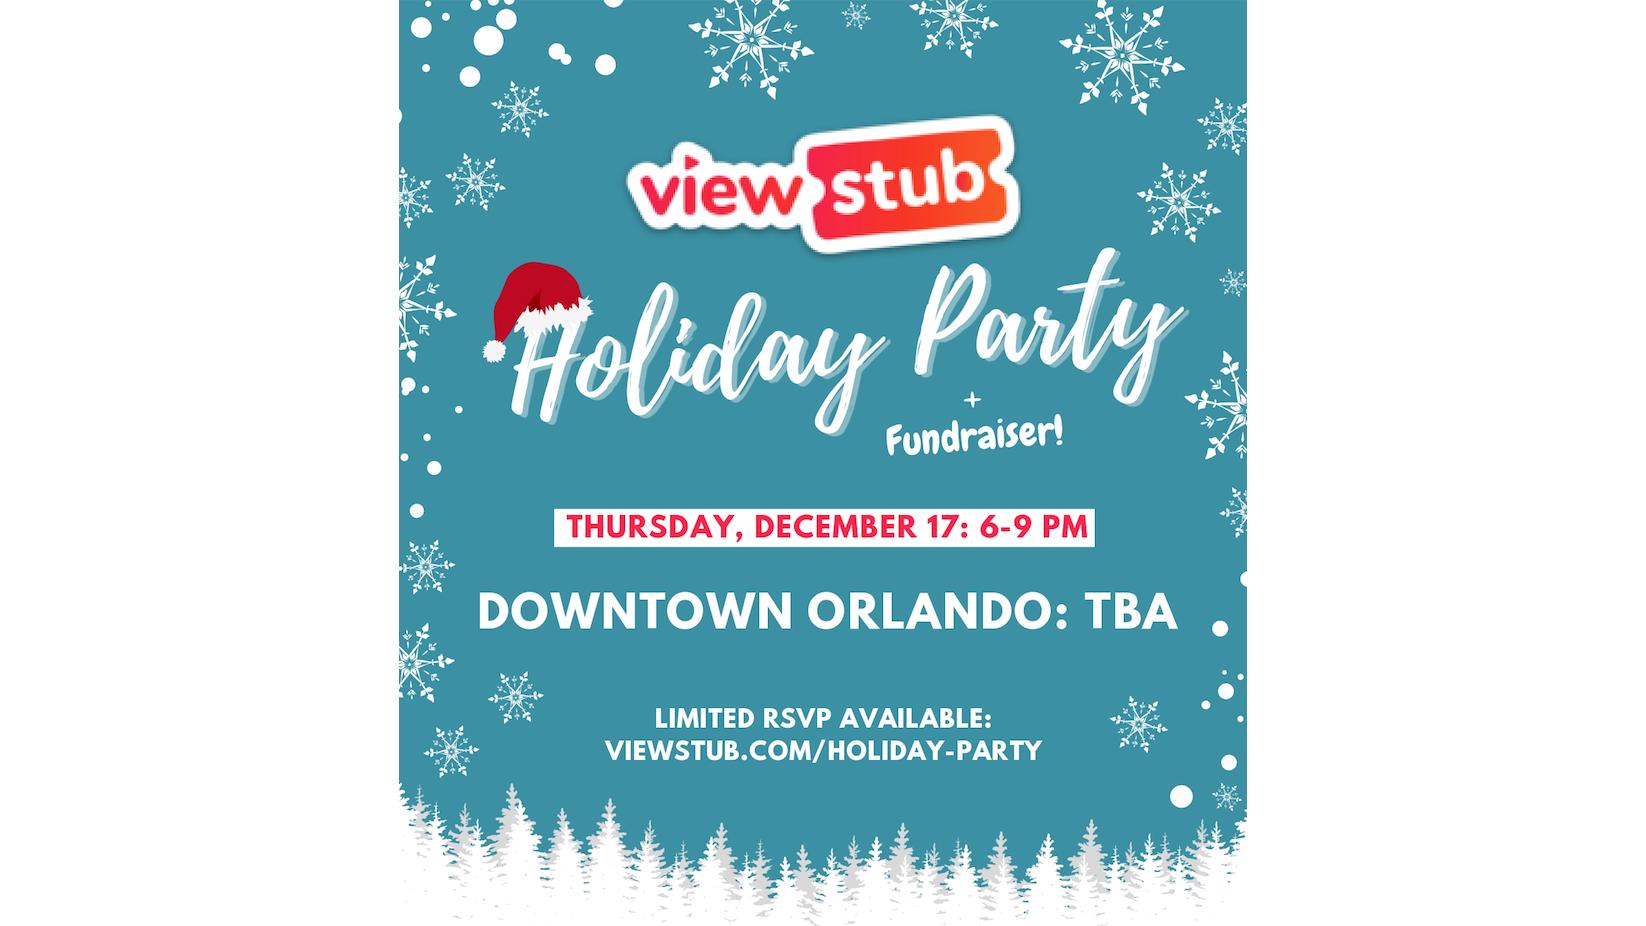 Photo for ViewStub Community Holiday Party on ViewStub